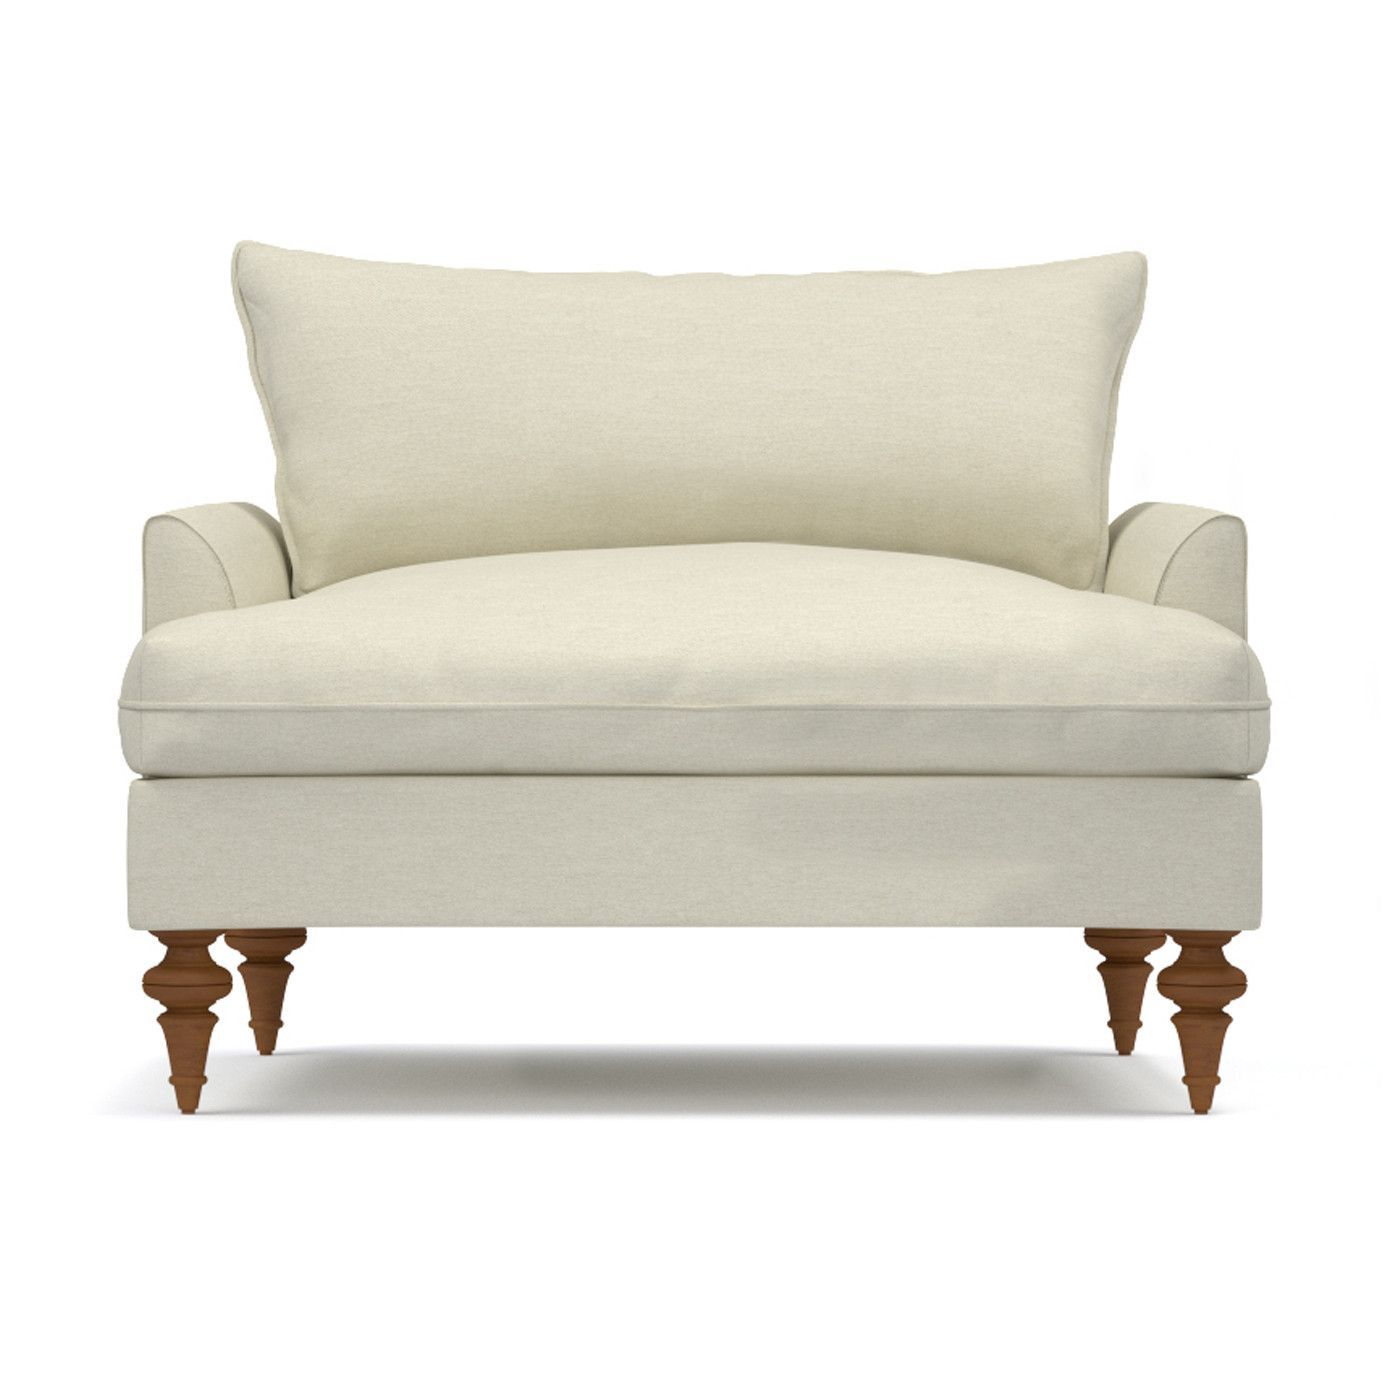 Saxon King Chair from Kyle Schuneman CHOICE OF FABRICS